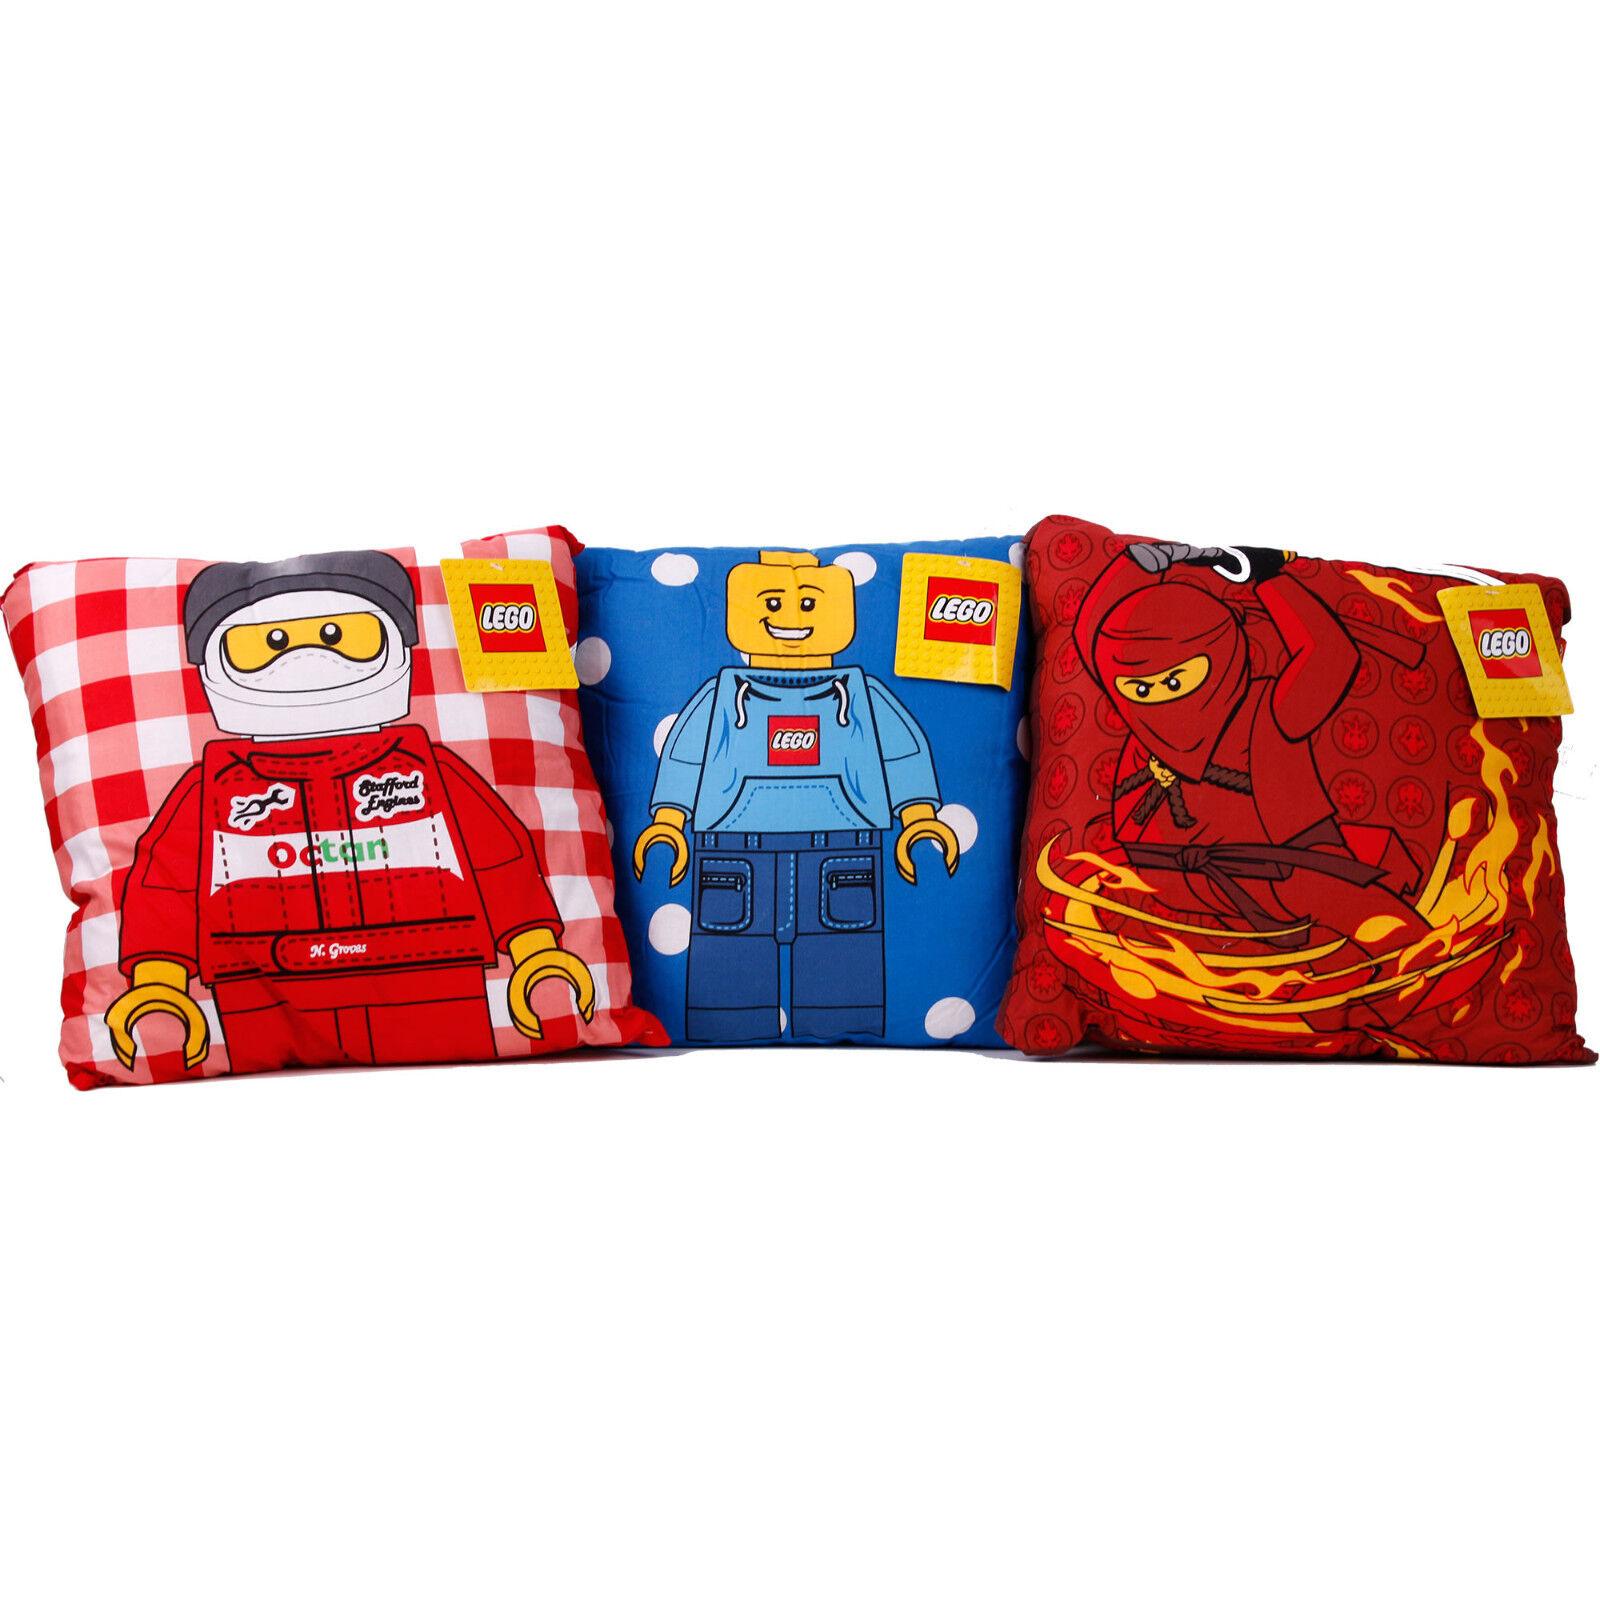 Lego Kissen Kopfkissen Bettwäsche 3er Set Kissenbezug Kissen Bezug Kissenhülle